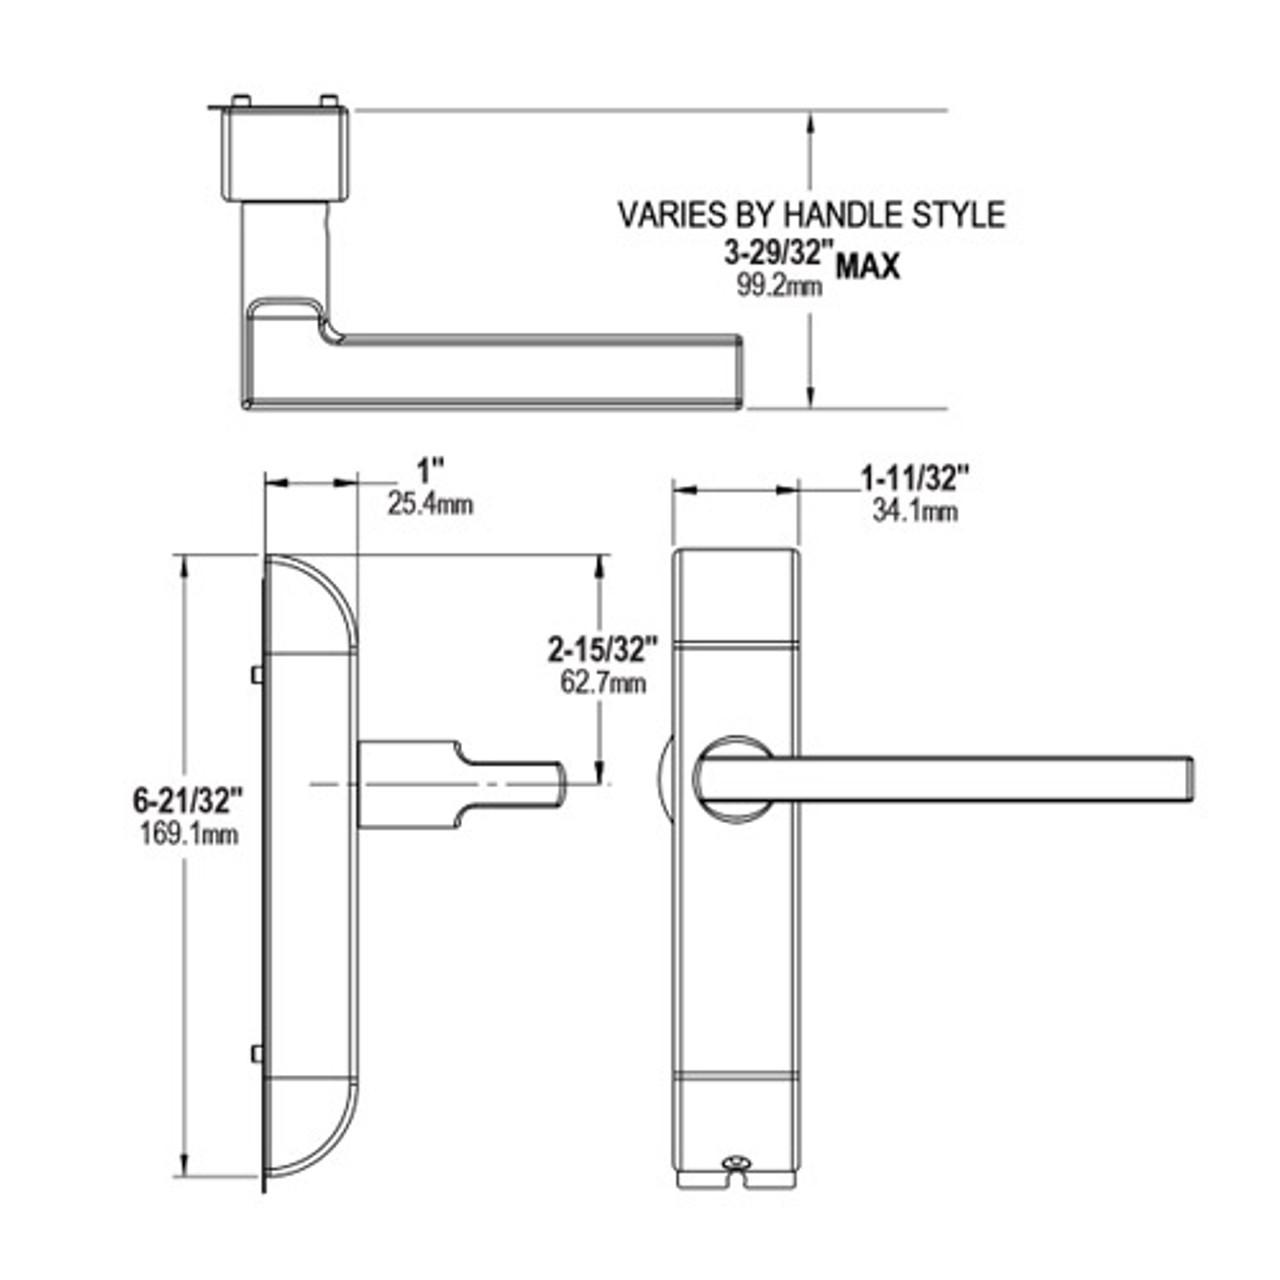 4600M-MW-621-US4 Adams Rite MW Designer handle Dimensional View